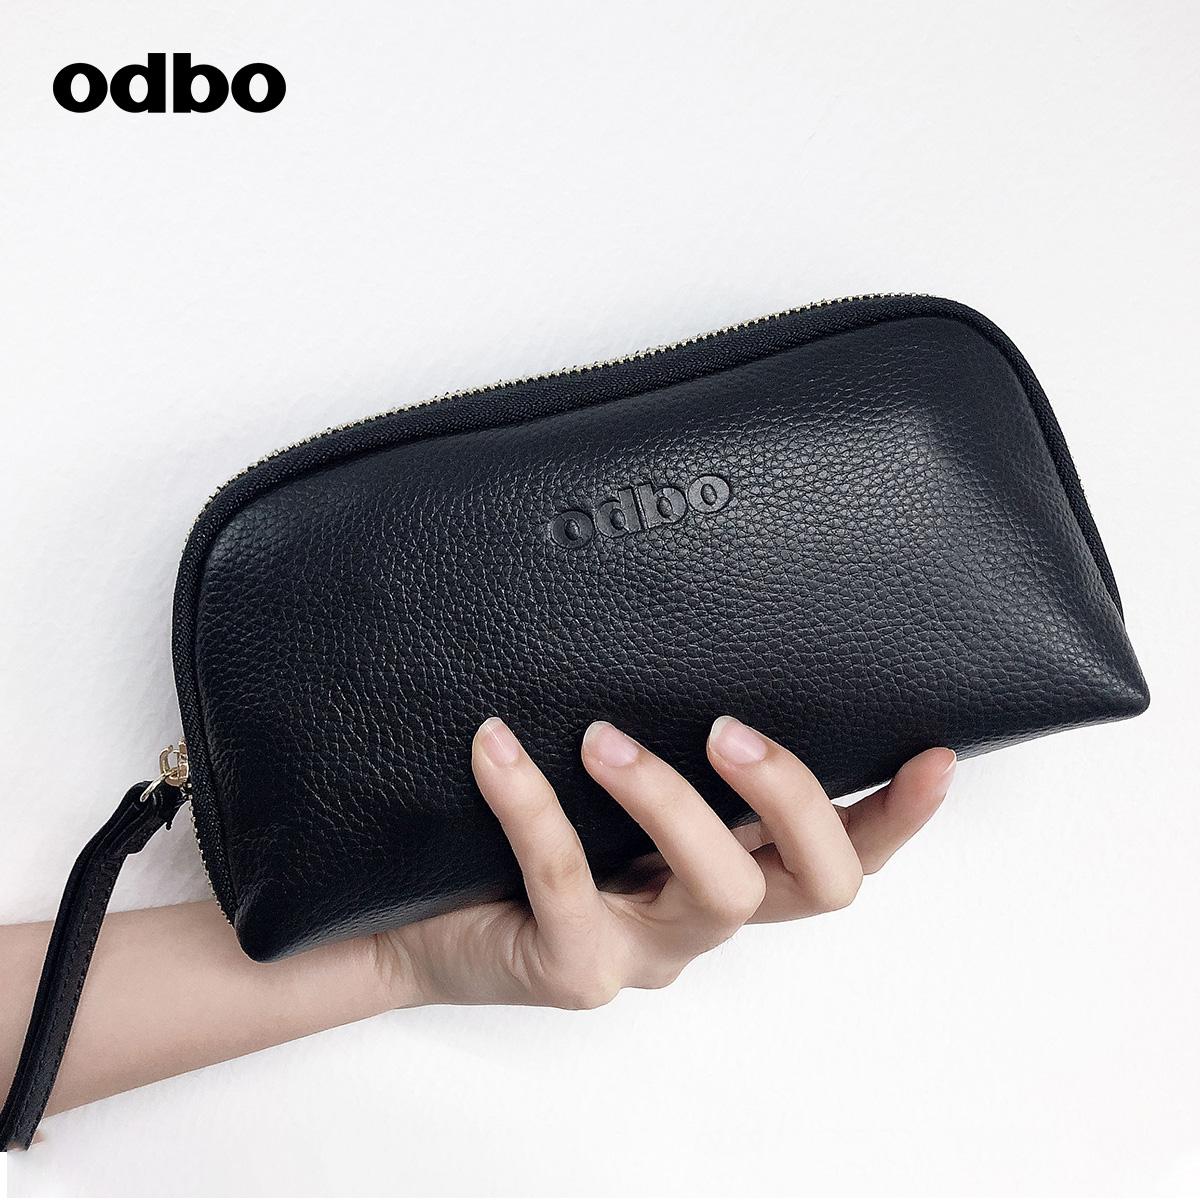 odbo原创设计潮牌2020新款真皮手拿包大容量拉链休闲情侣款手抓包